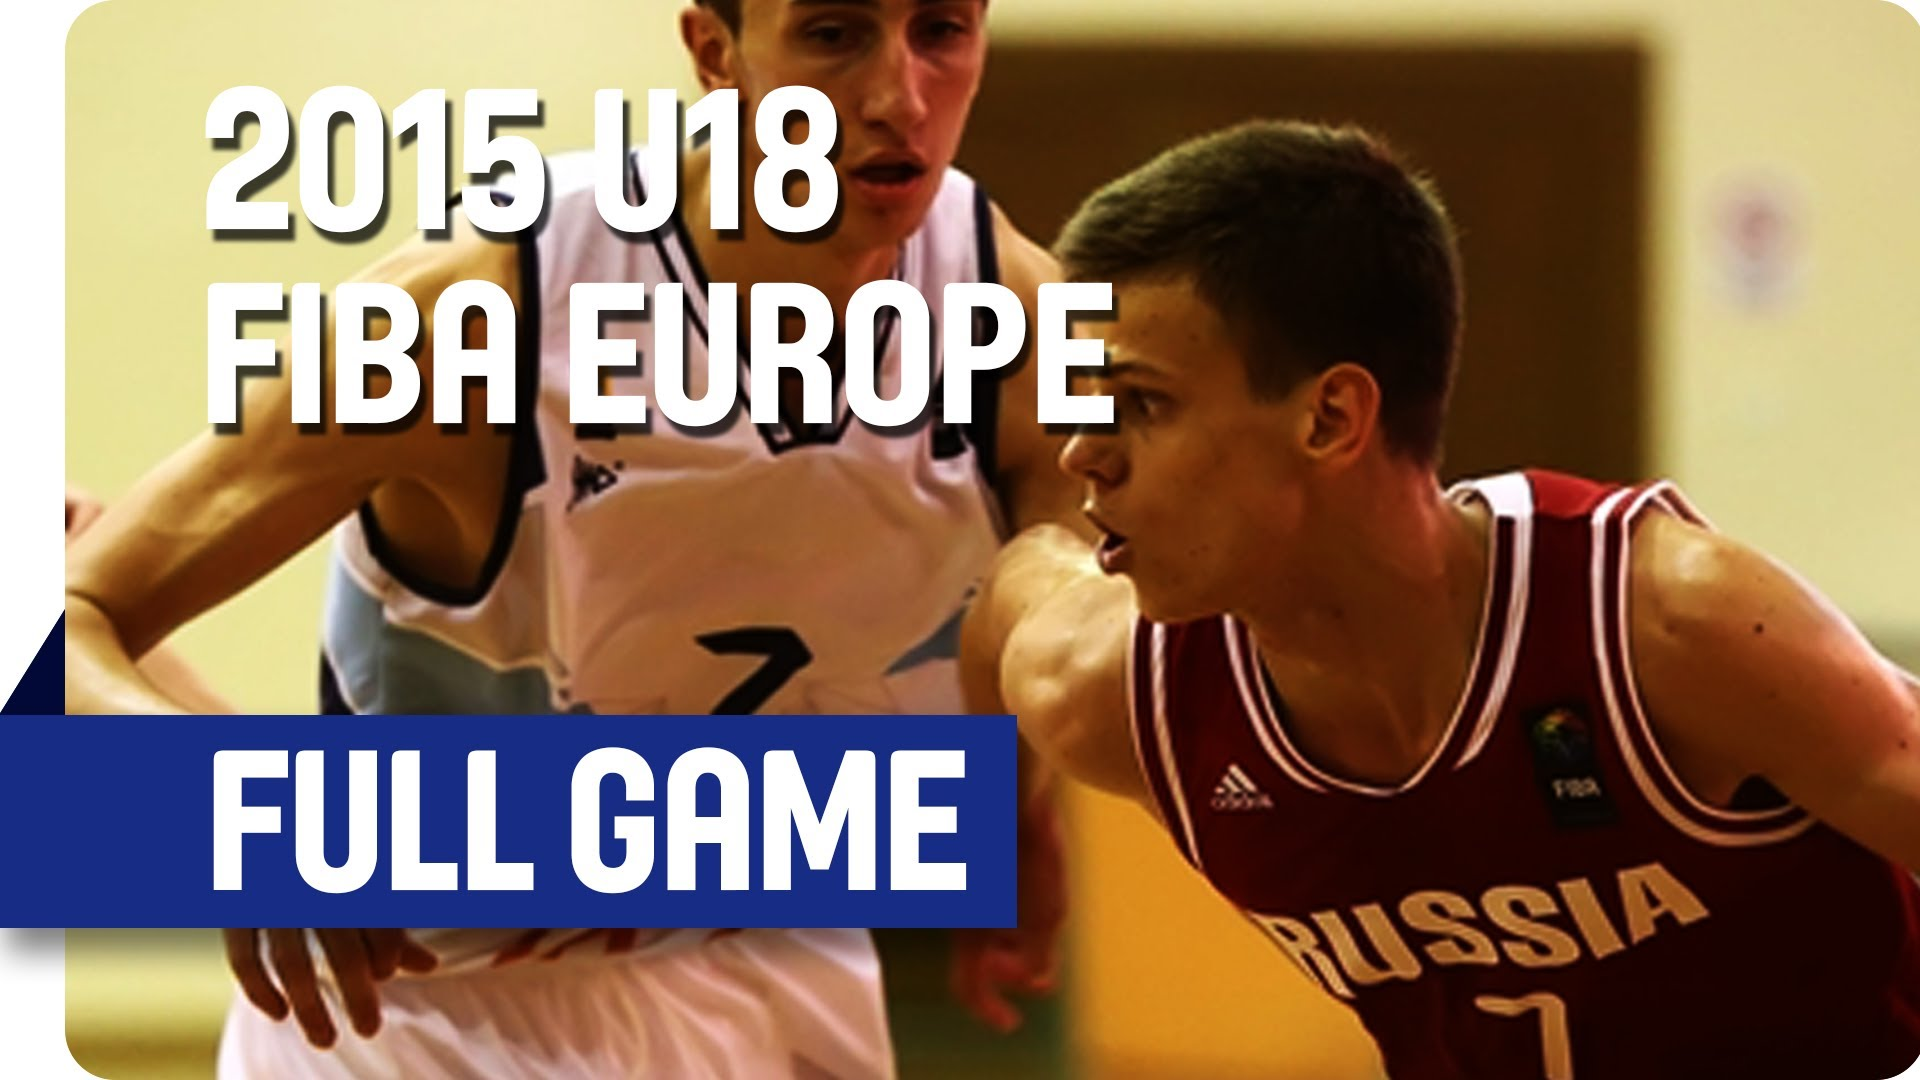 Latvia v Russia - Game for 9th - Live Stream - 2015 U18 European Championship Men